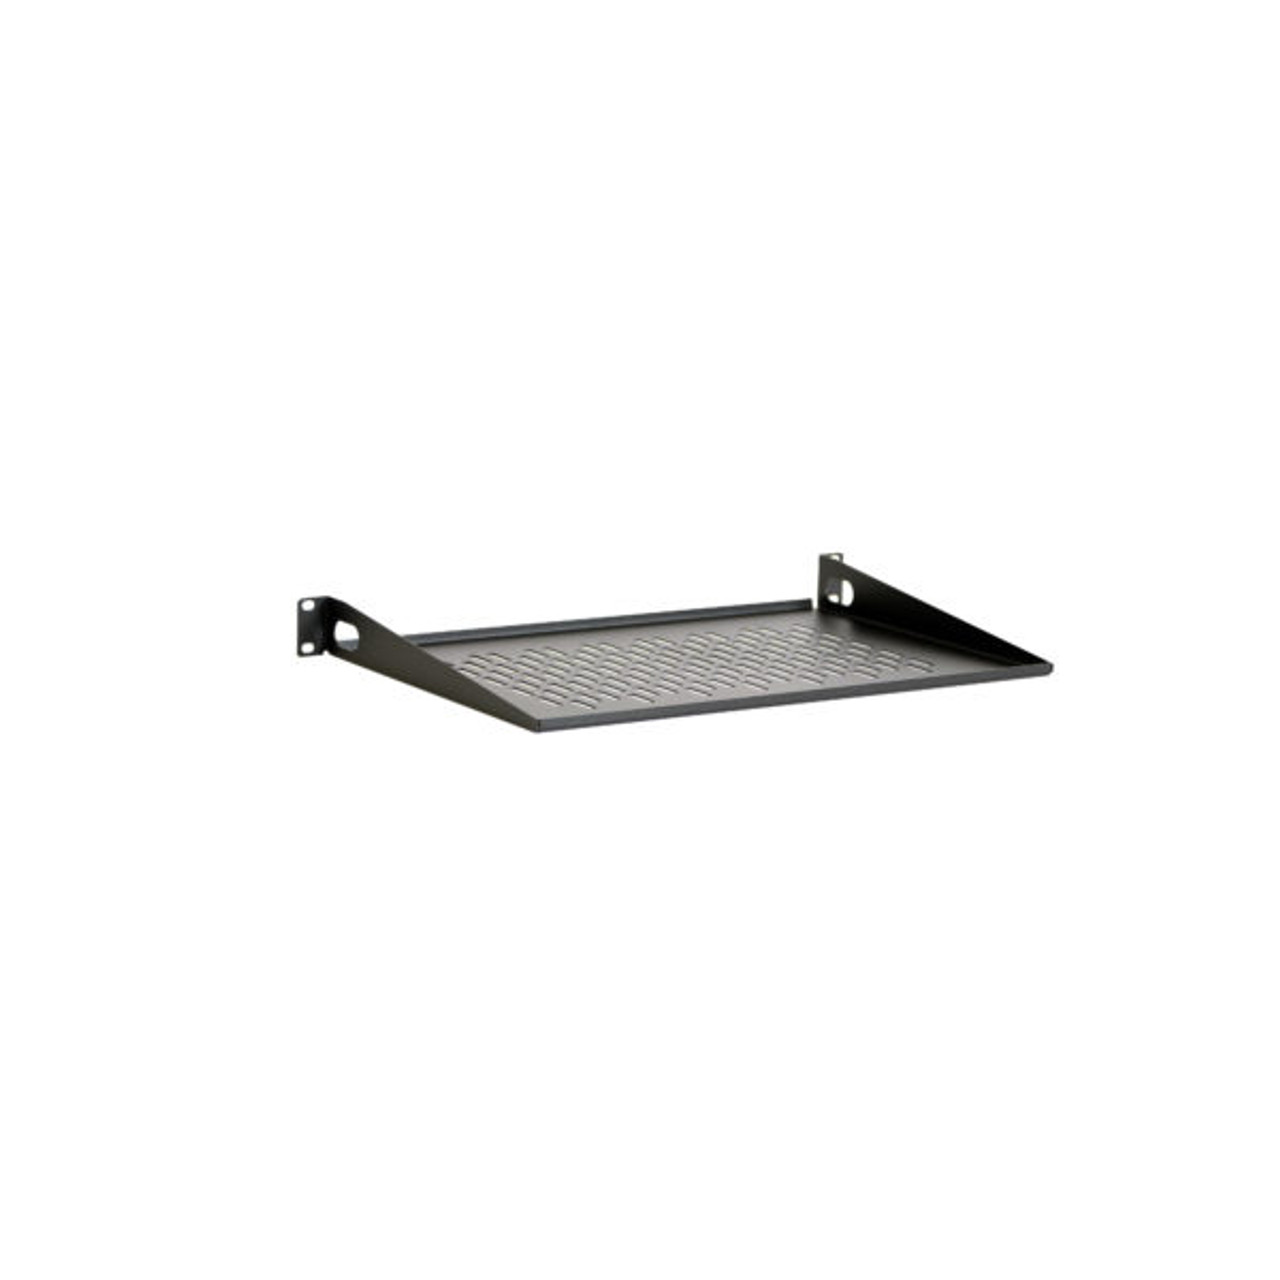 1u 12 vented light duty rack shelf